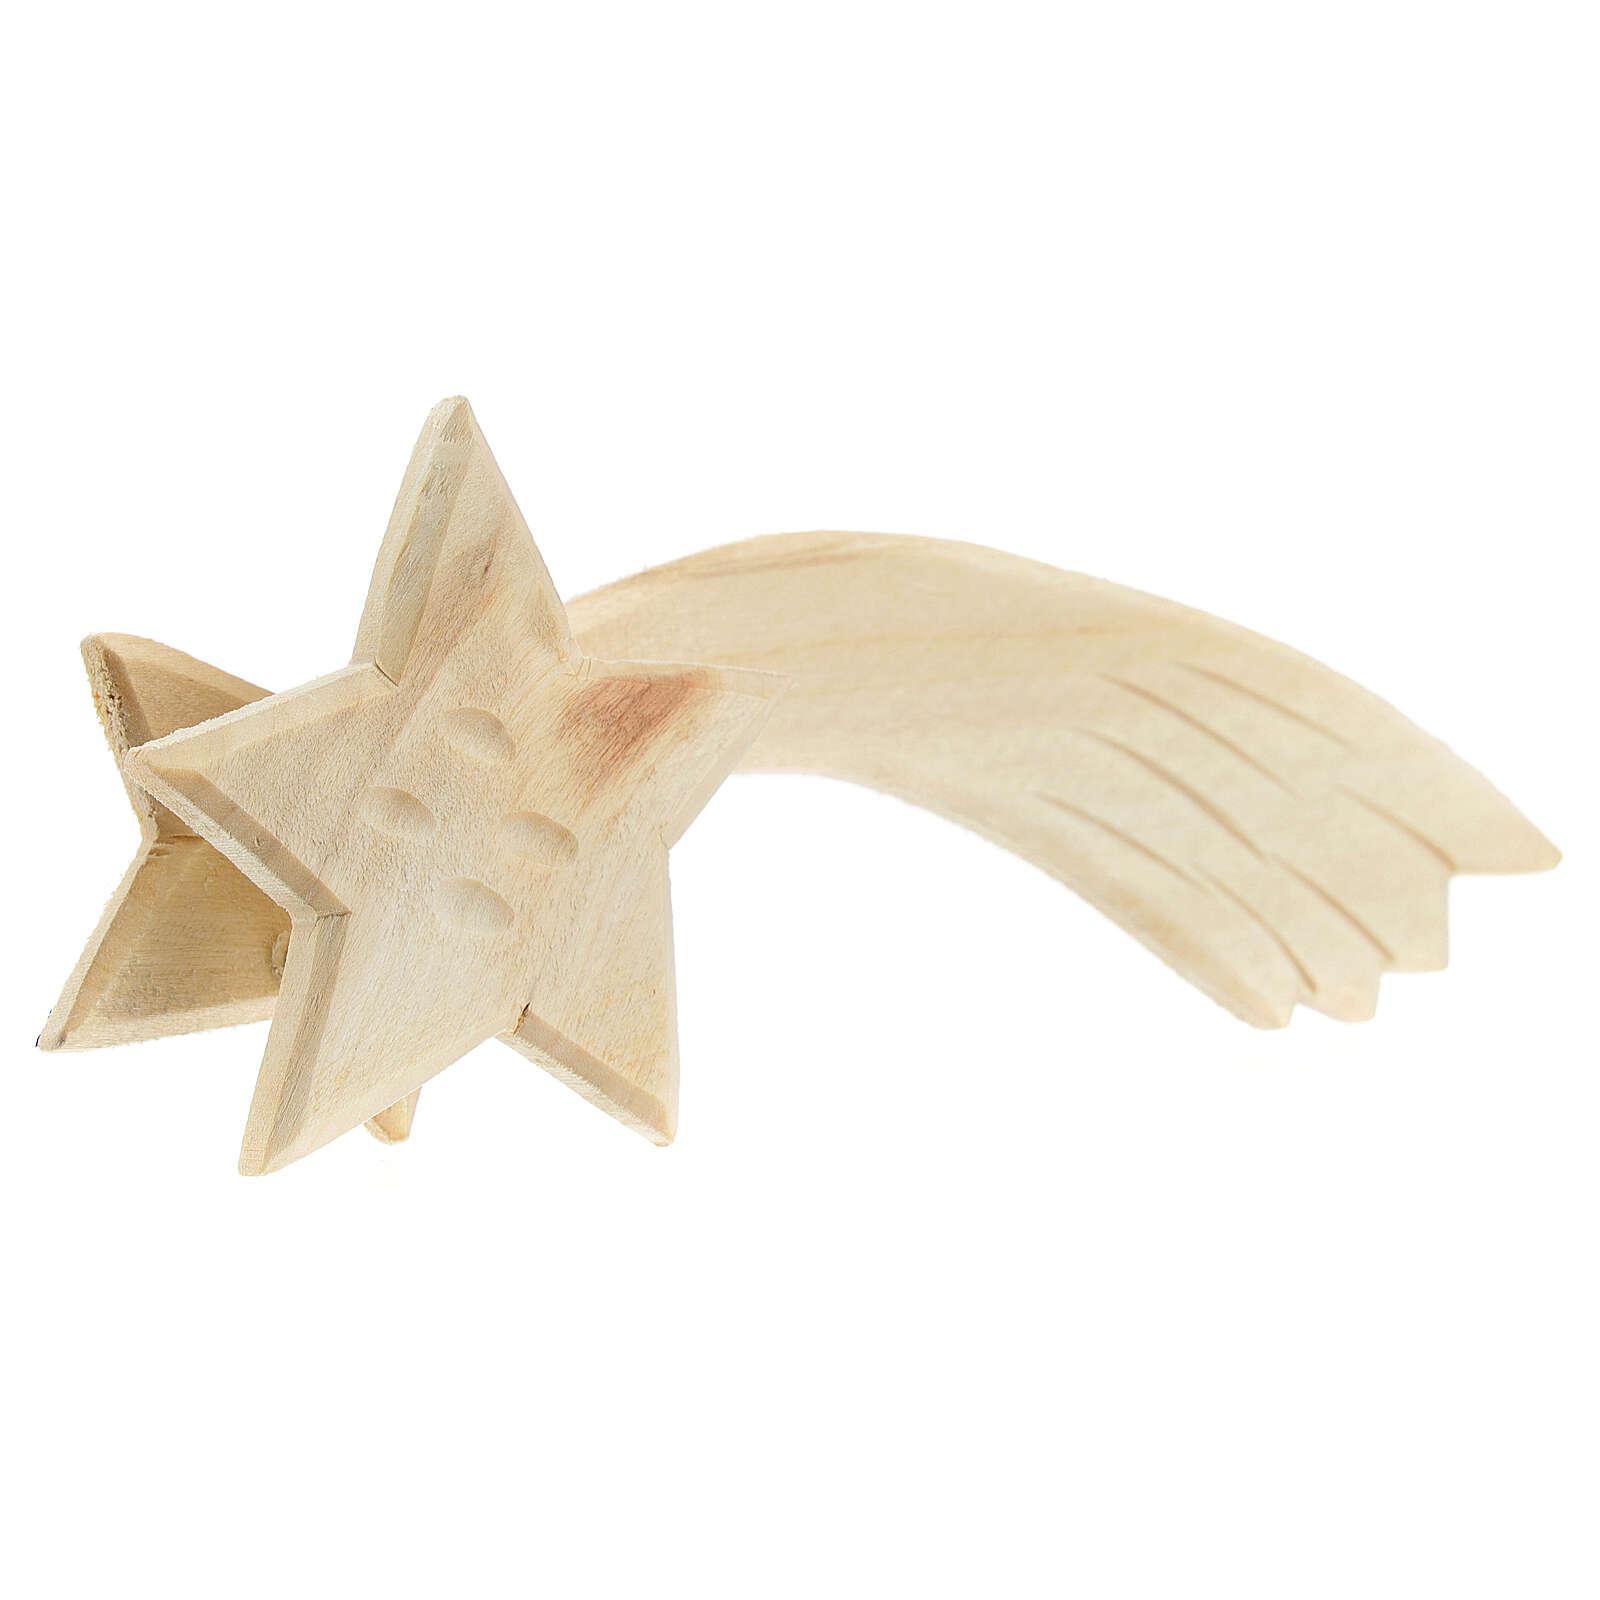 Estrella cometa madera y luz 3,5V 15x5x2 cm 4